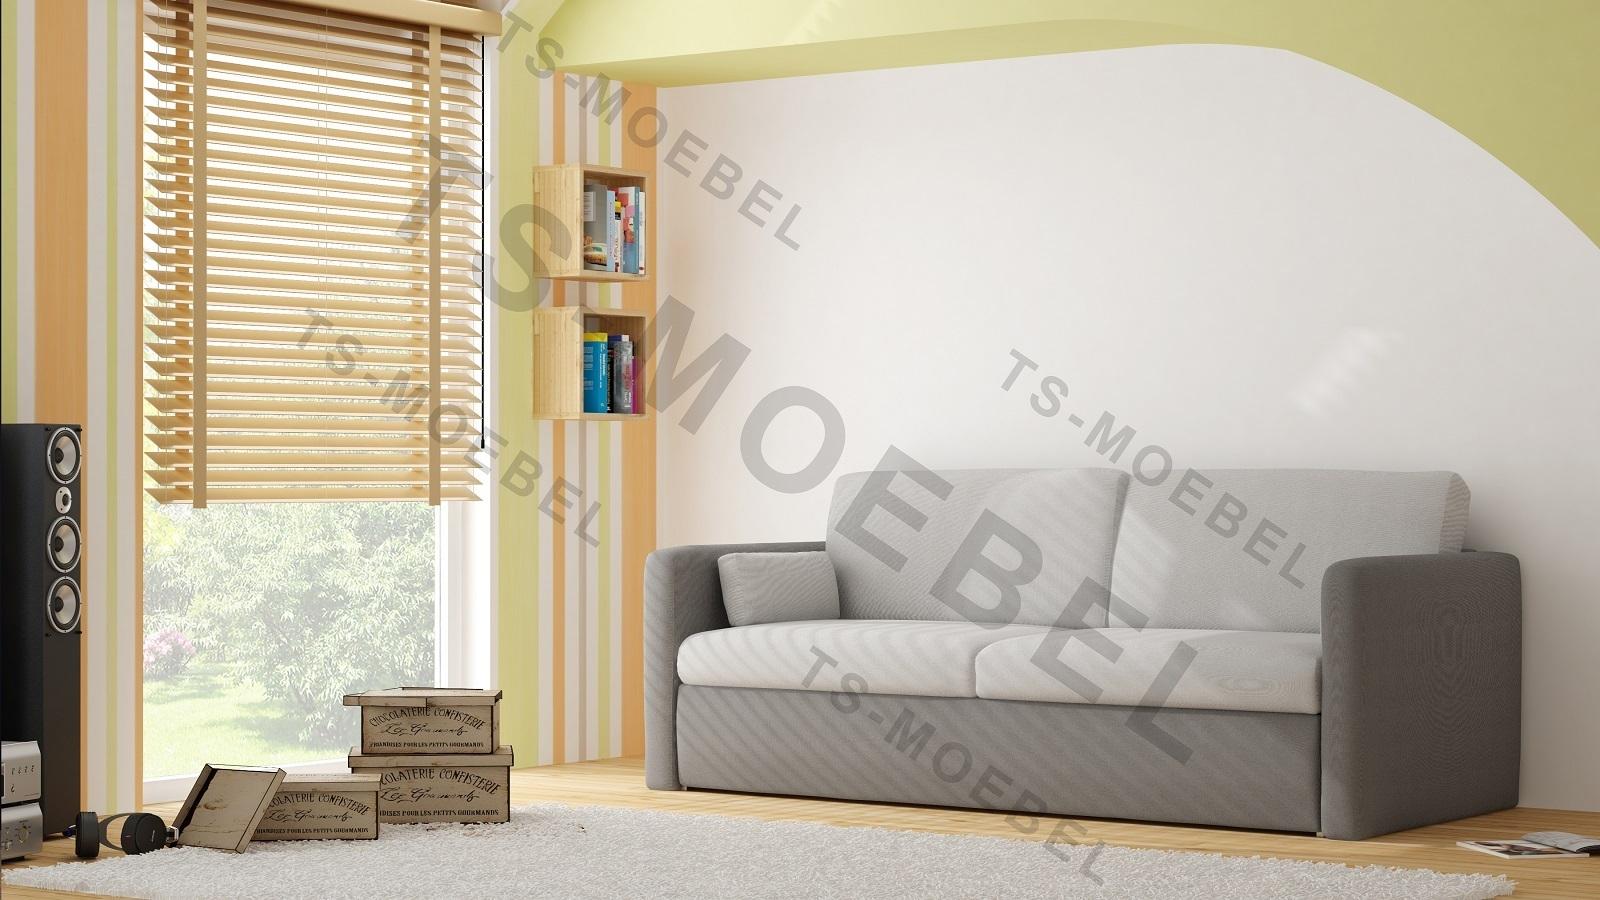 Etagenbett Sofa Duo : Etagenbett sofa hochbett mit drunter amazing luxus